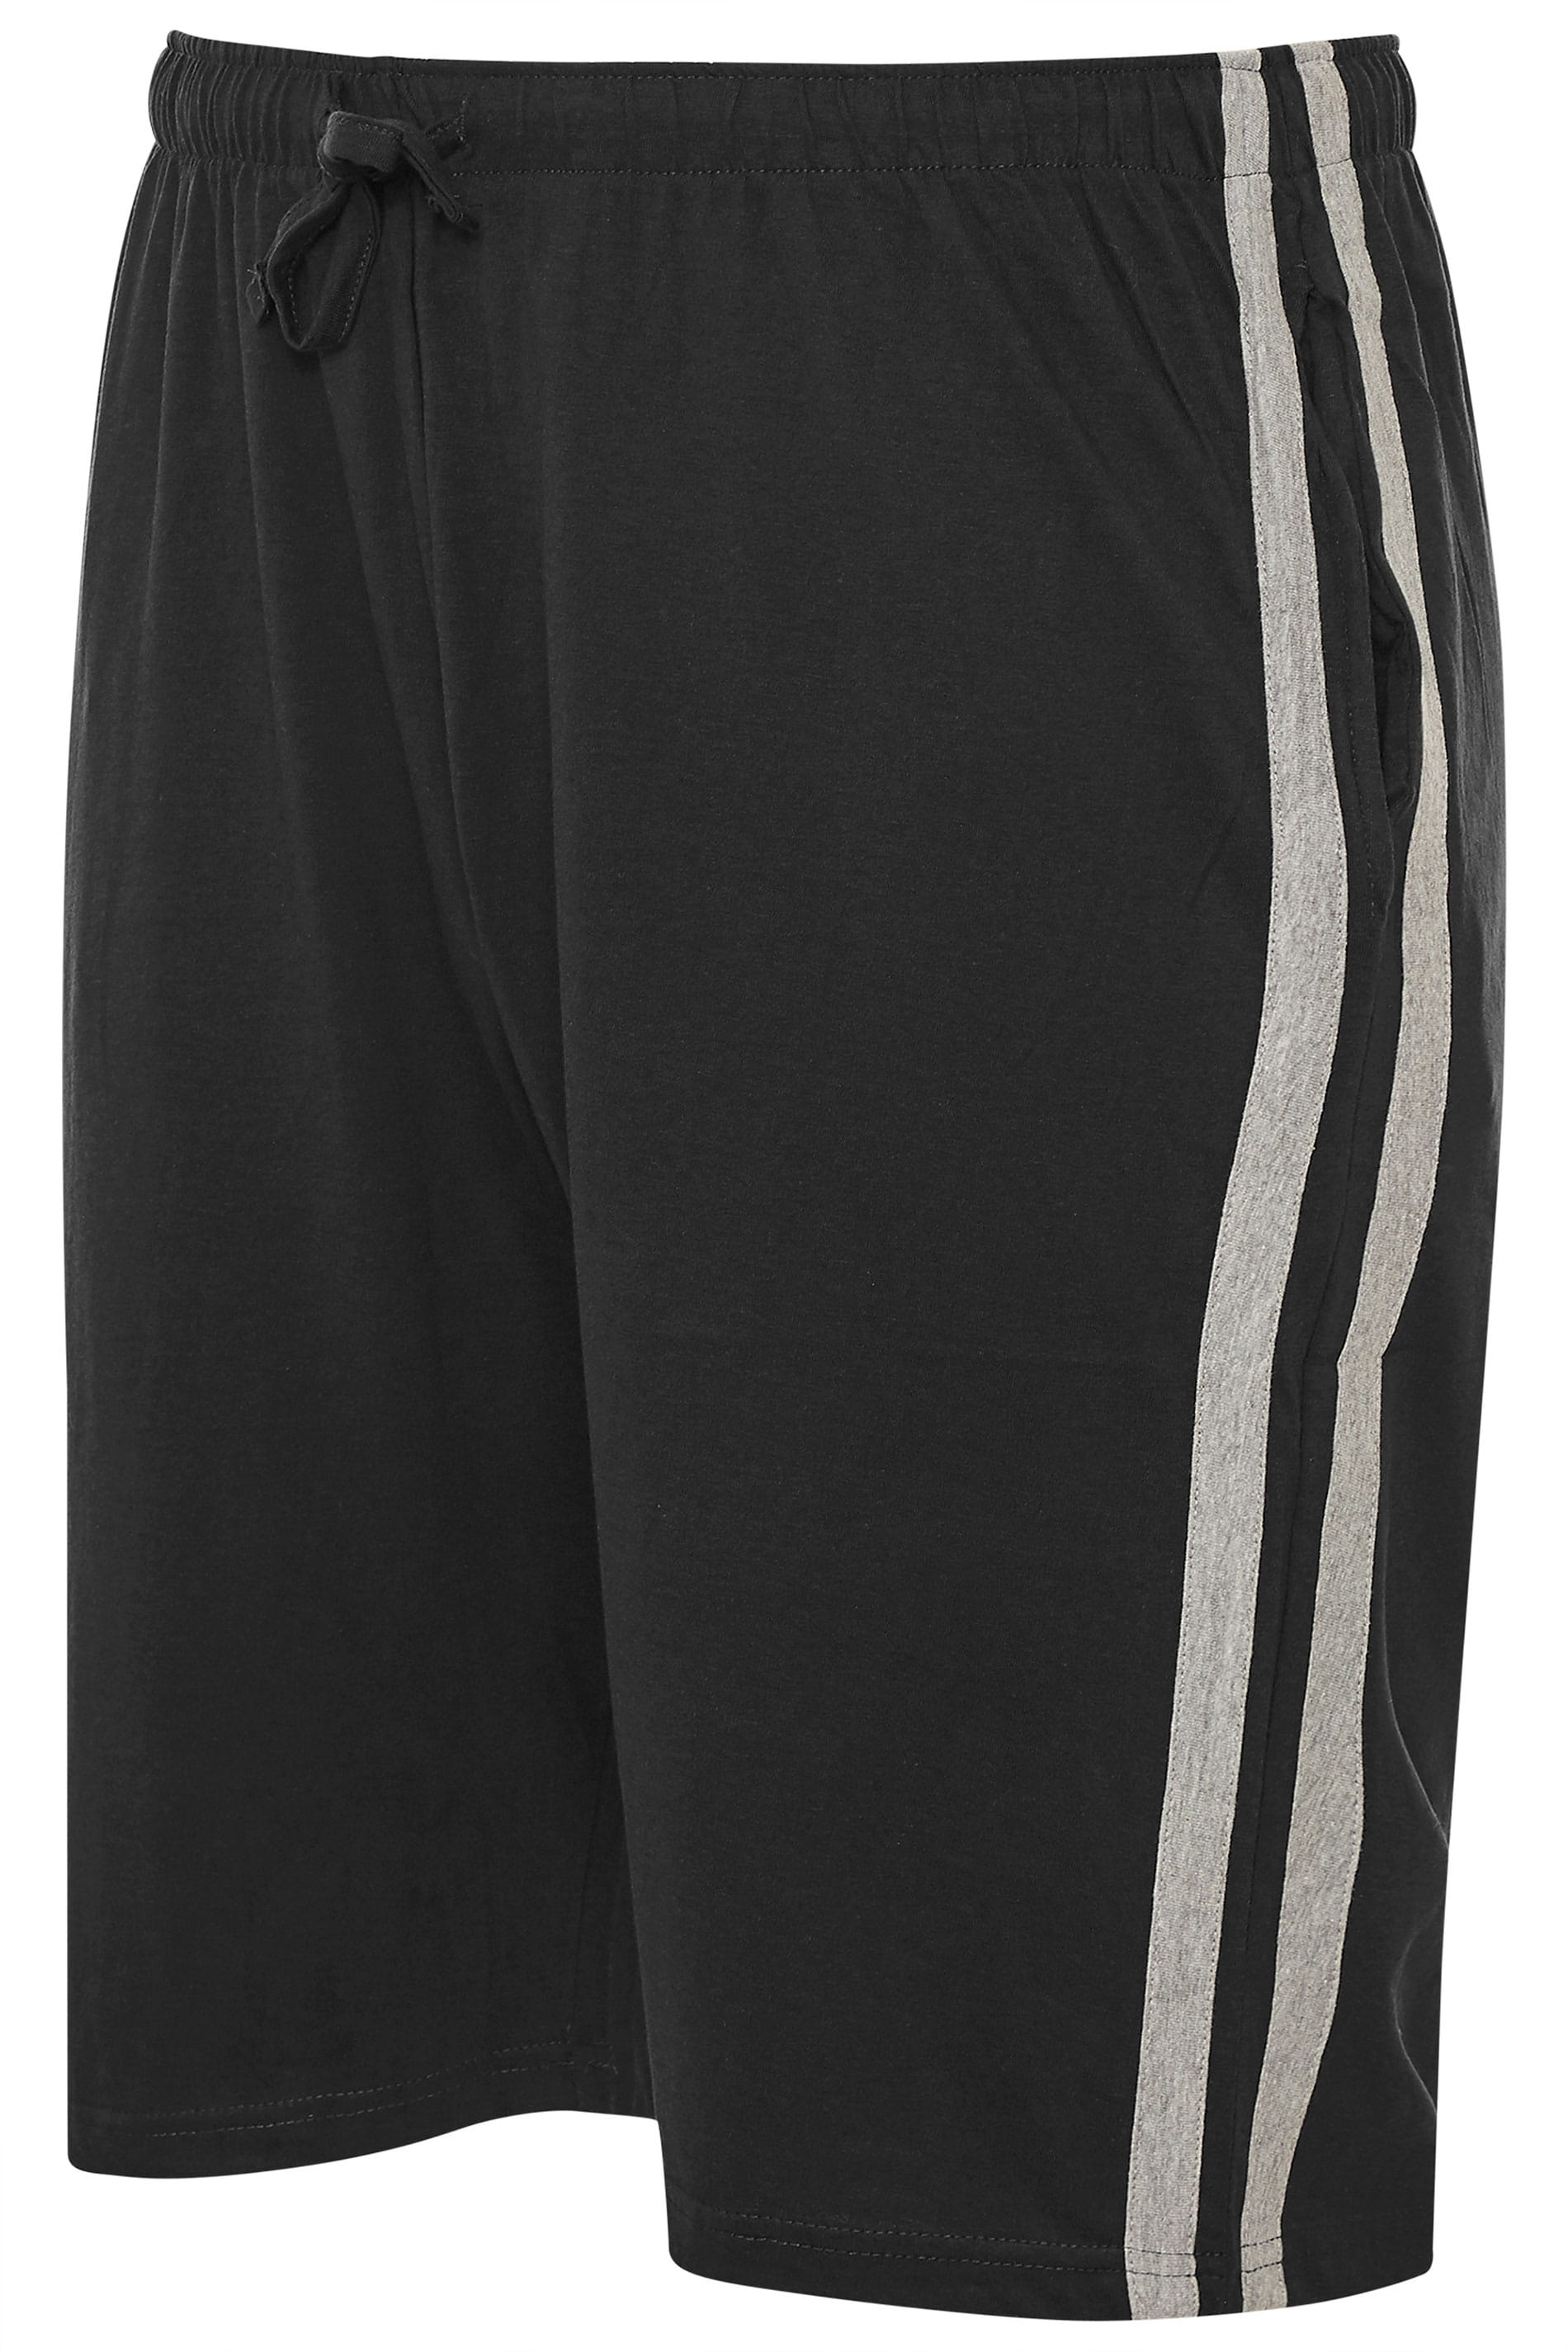 ED BAXTER Black Lounge Jogger Shorts